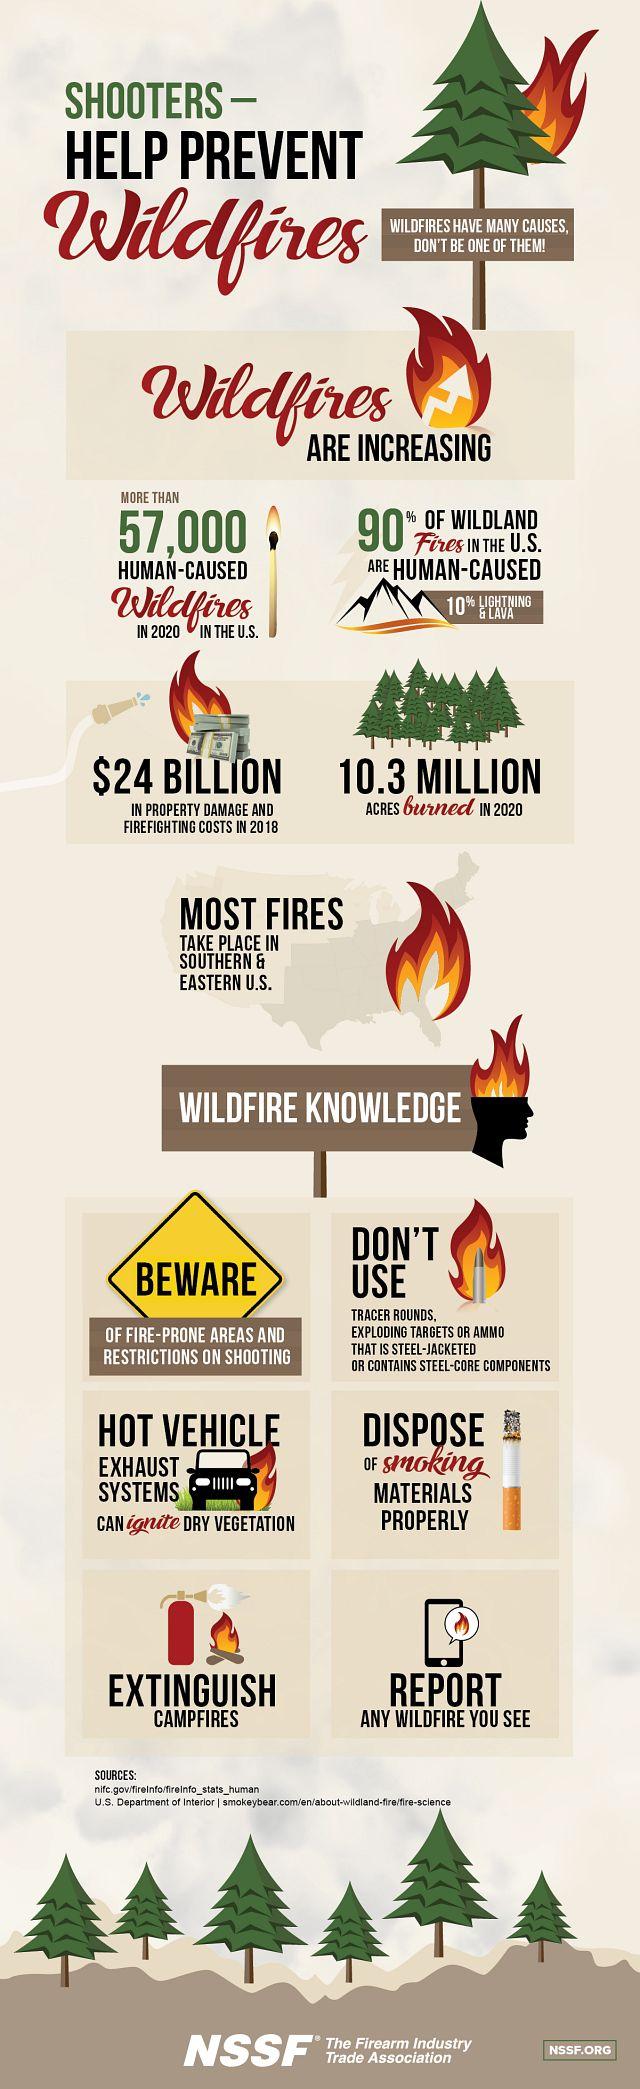 Wildfire-Infographic.jpeg